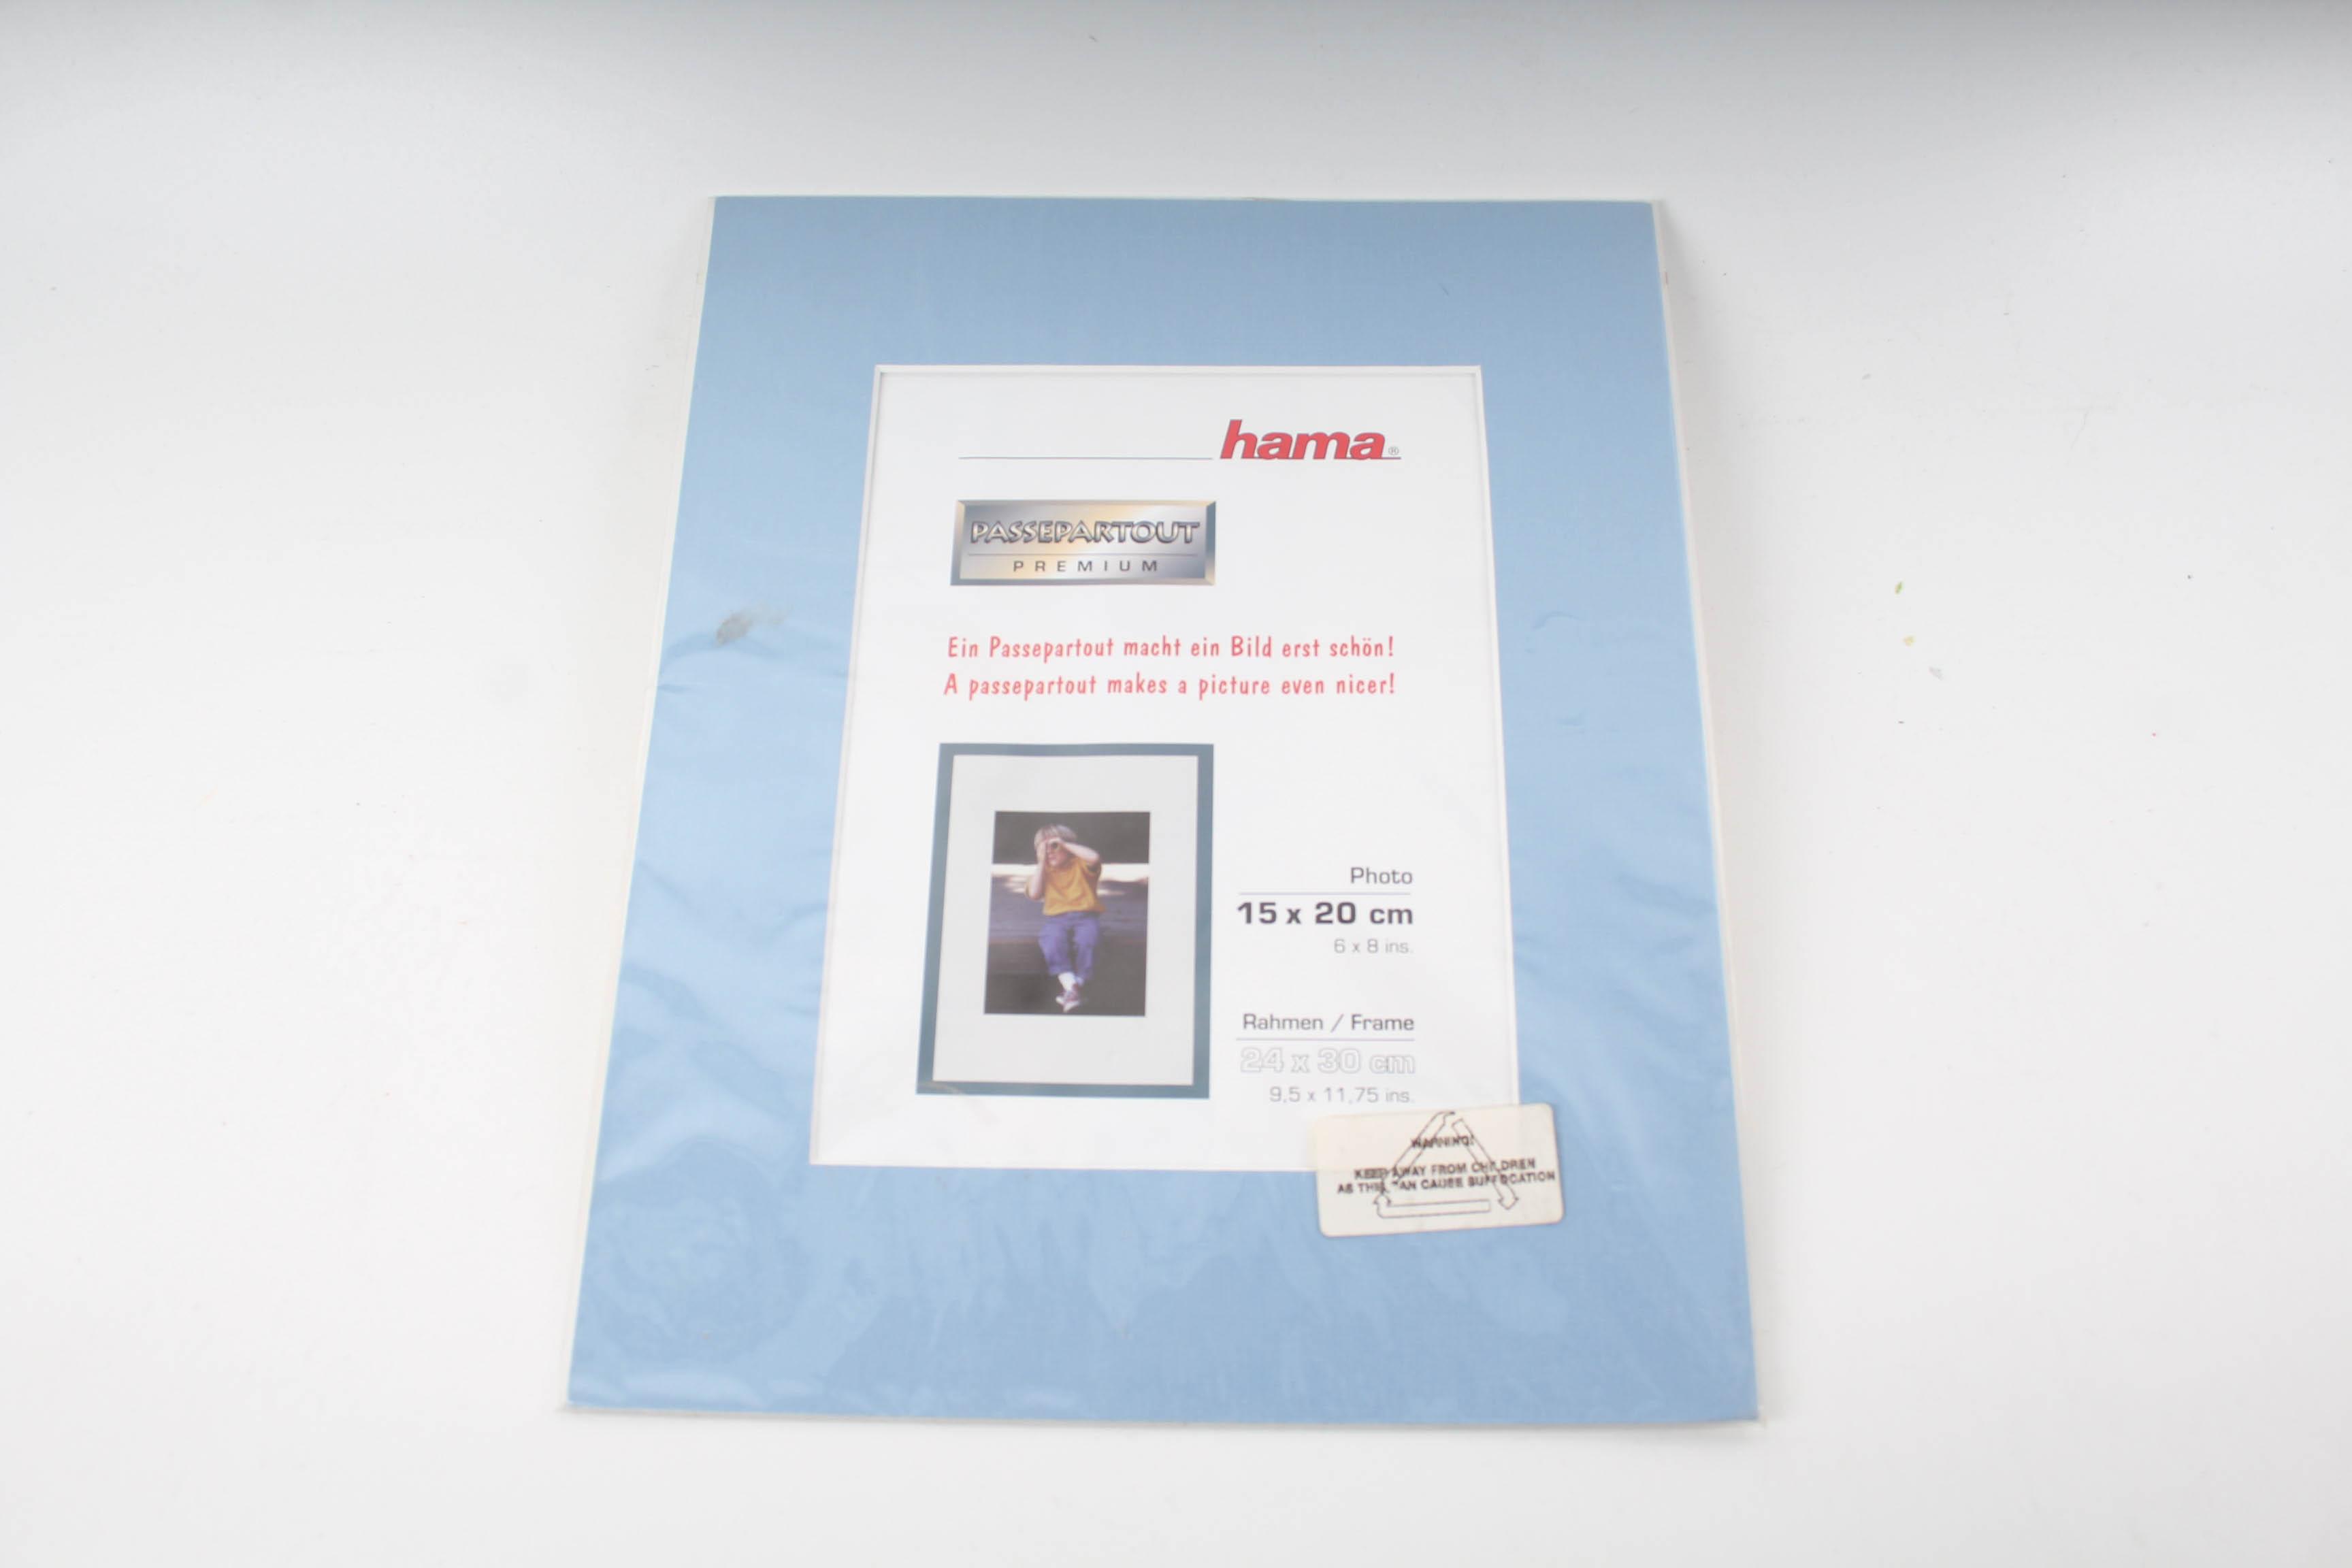 Hama Passepartout 15 x 20 cm Rahmen 25 x 30 cm Hellblau | eBay